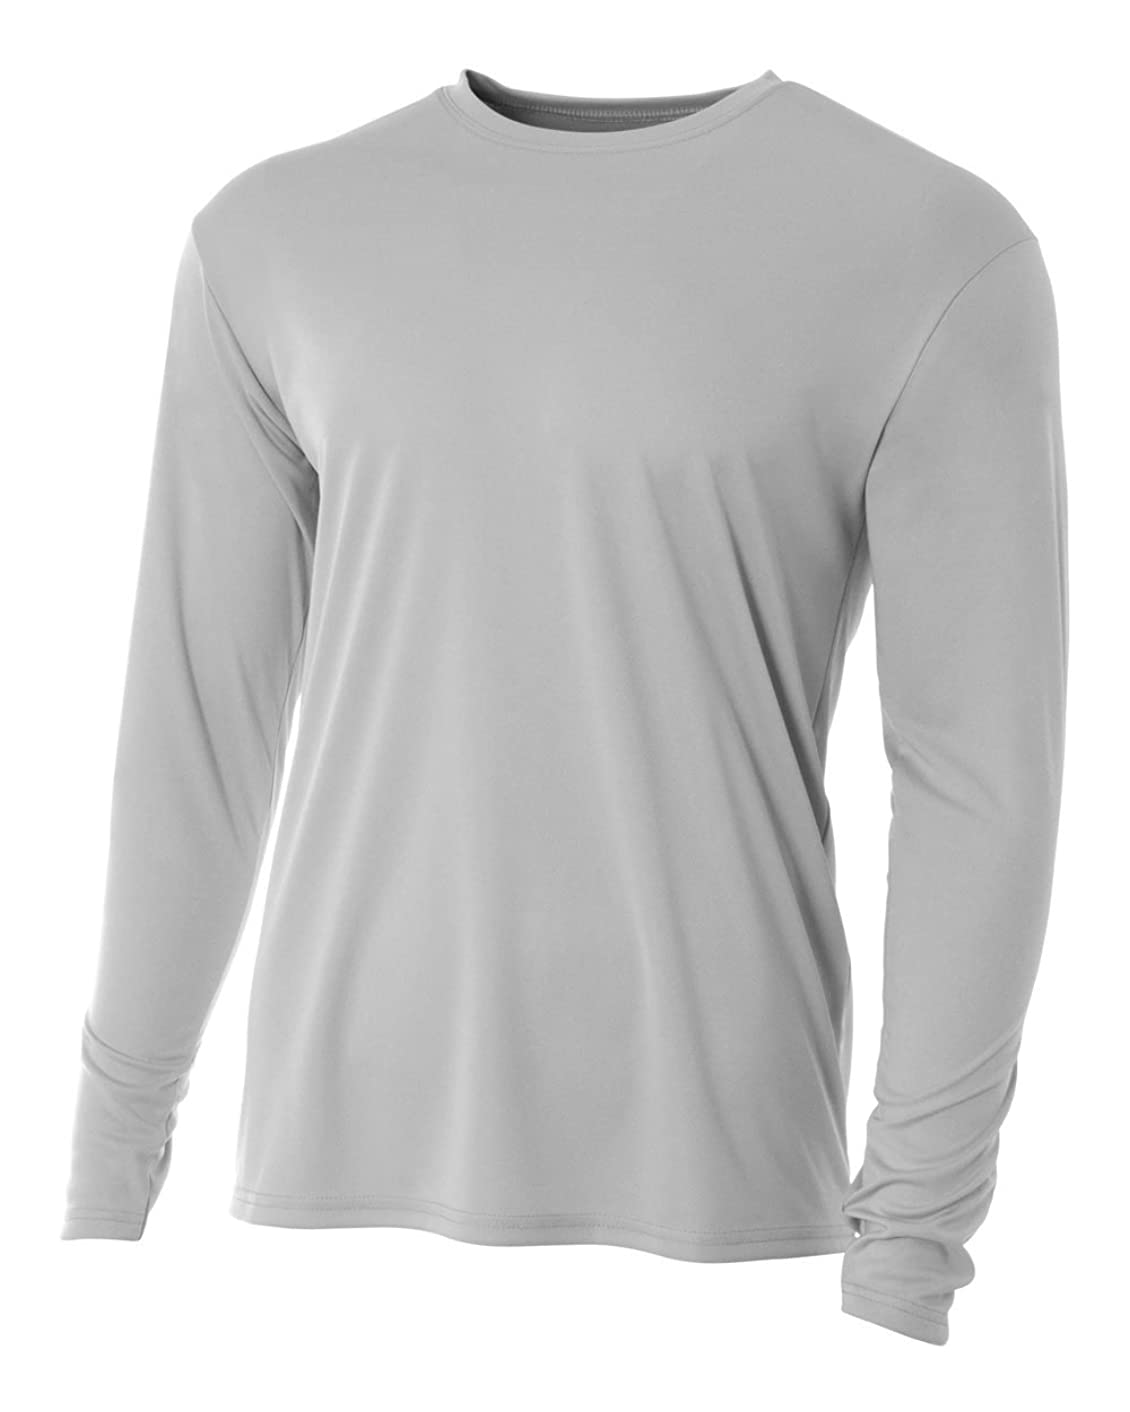 Long Sleeve Wicking Moisture Management Cooling Athletic Shirt/Undershirt Crewneck (All Sports: Baseball, Softball, Soccer, Volleyball, Football, Basketball, Casual Wear…)